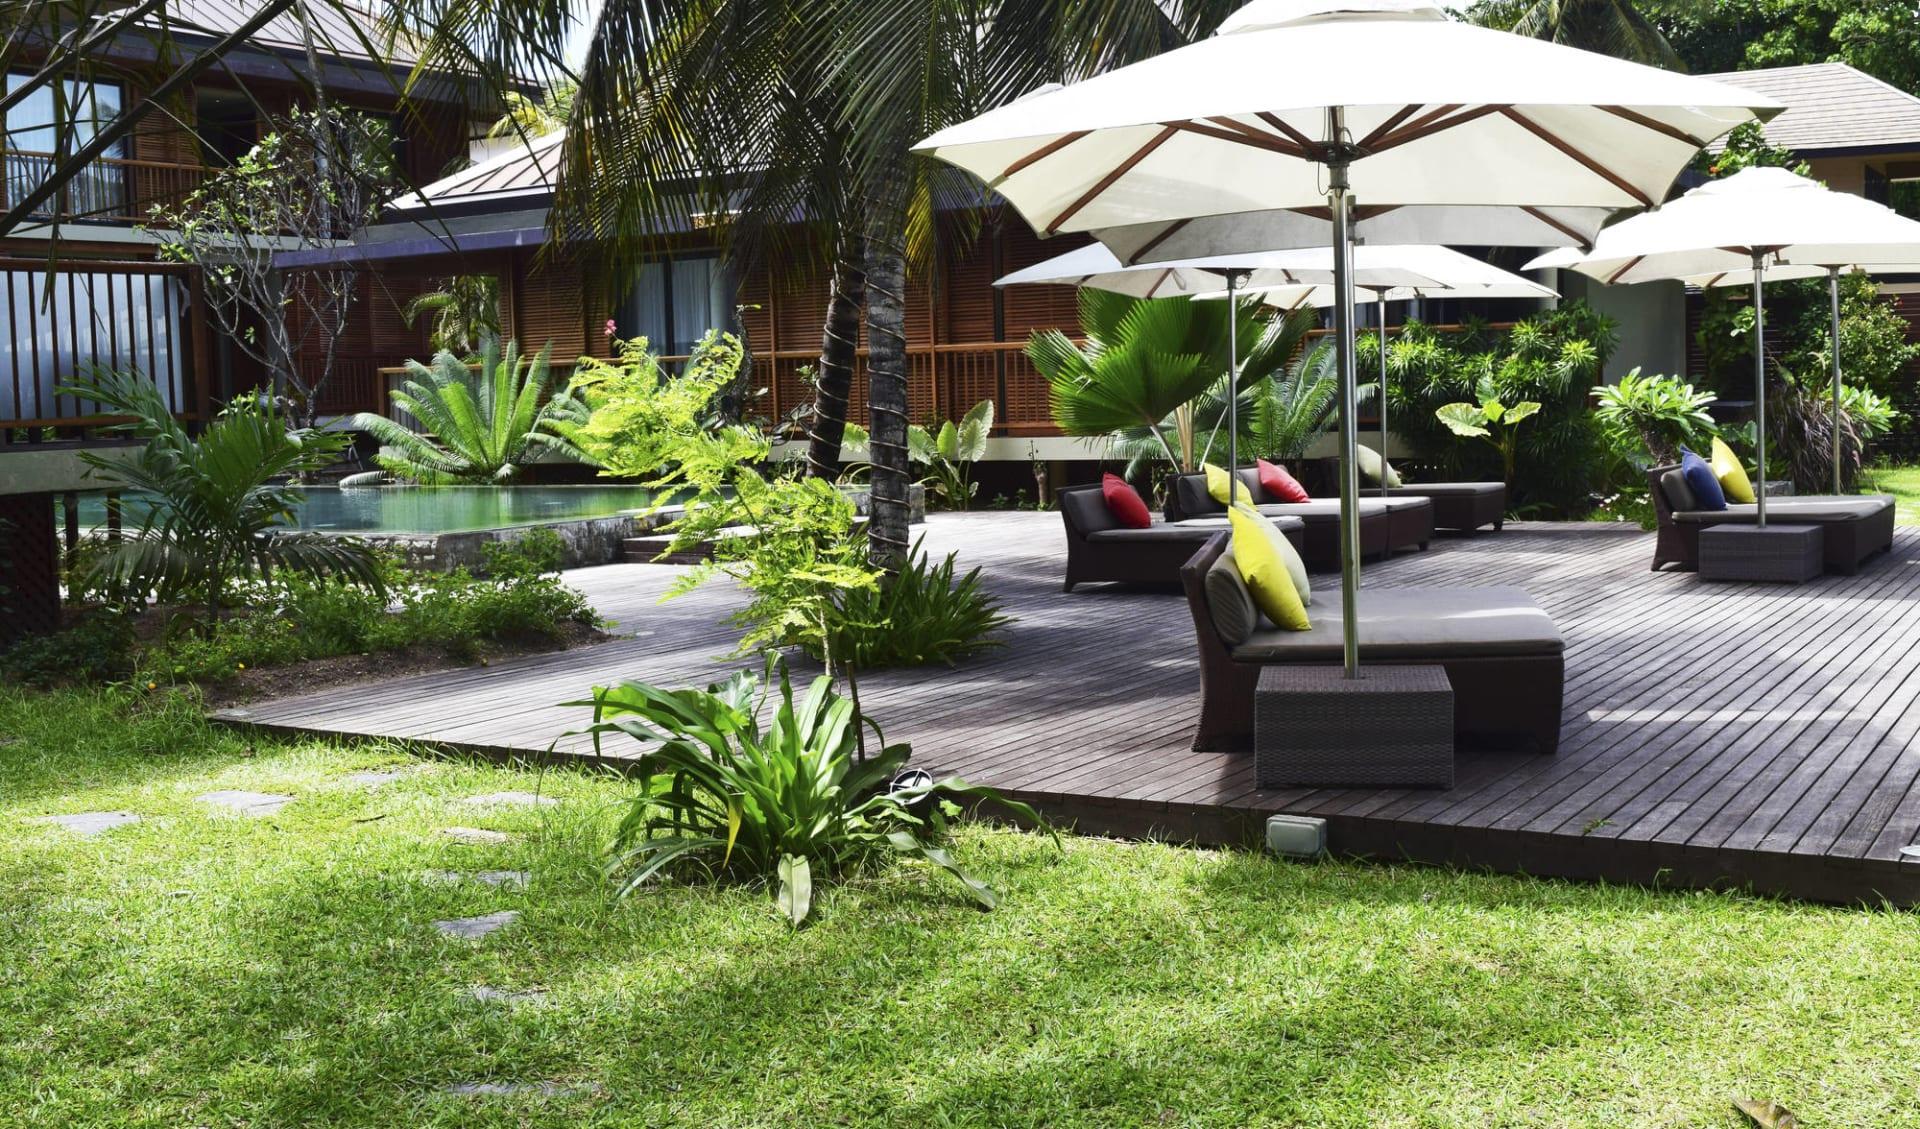 Dhevatara Beach Hotel in Praslin: